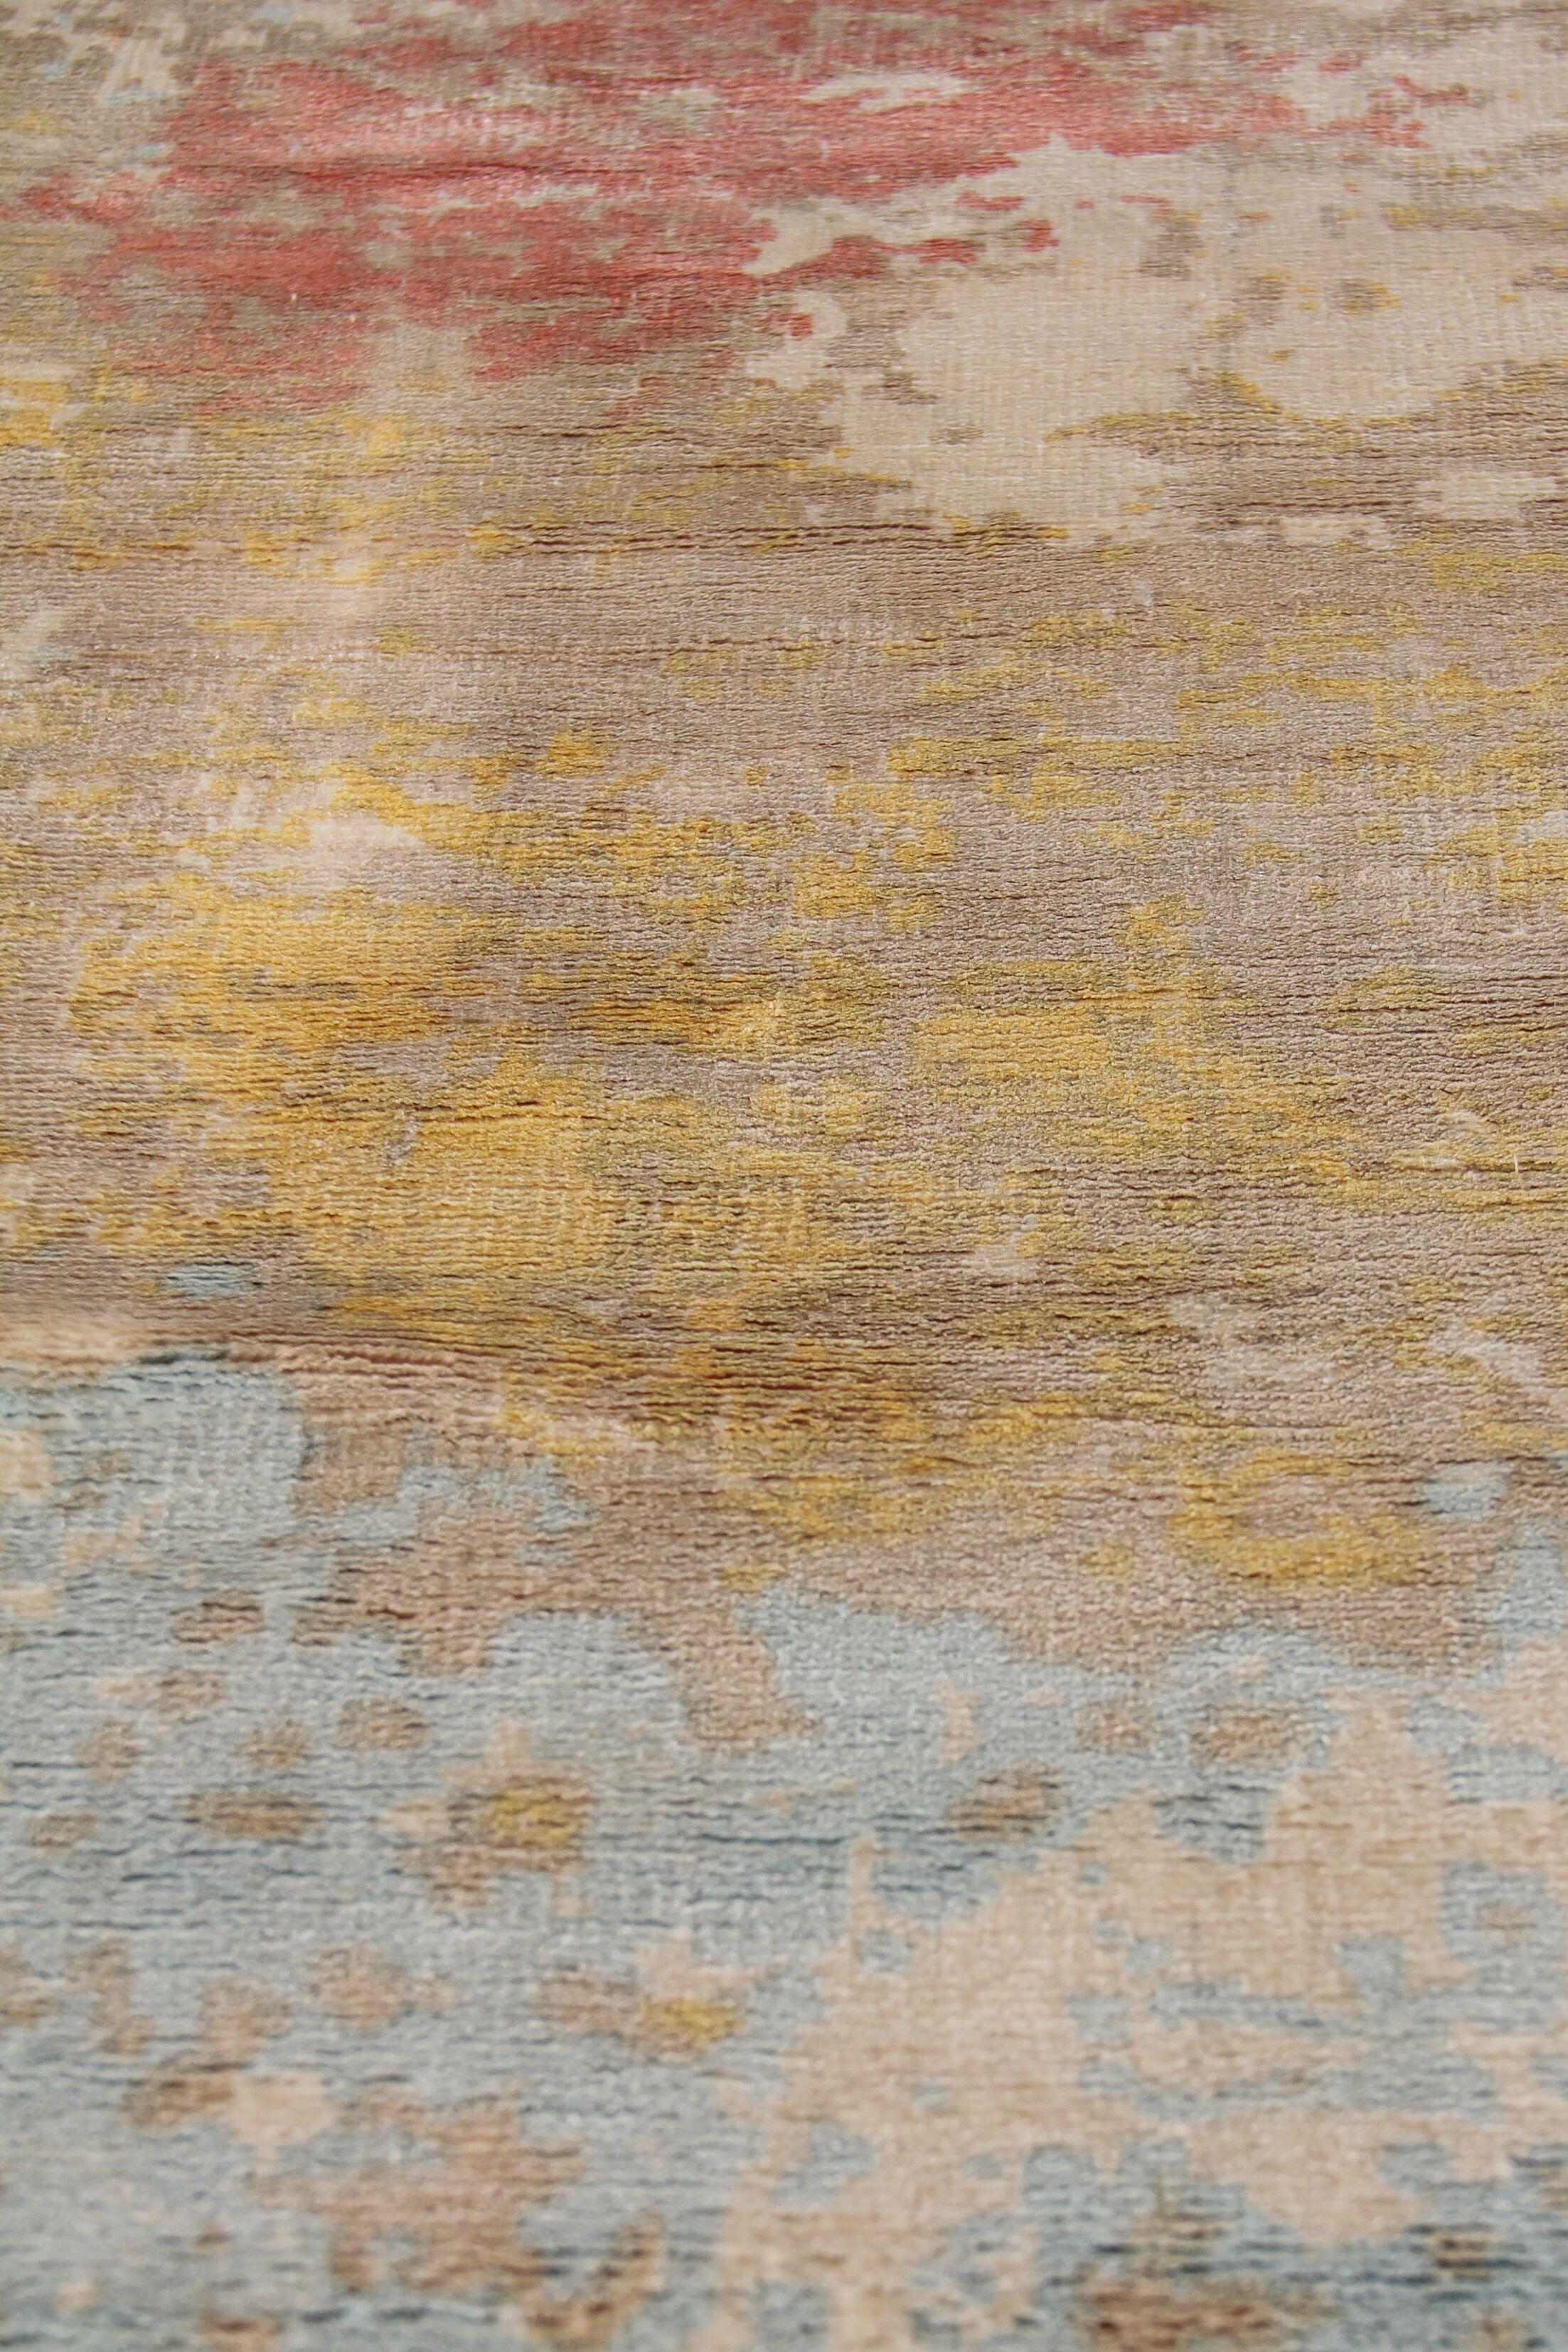 Carrera Hand Woven Silk Sky Blue/Gold Area Rug Rug Size: Rectangle 9' x 12'